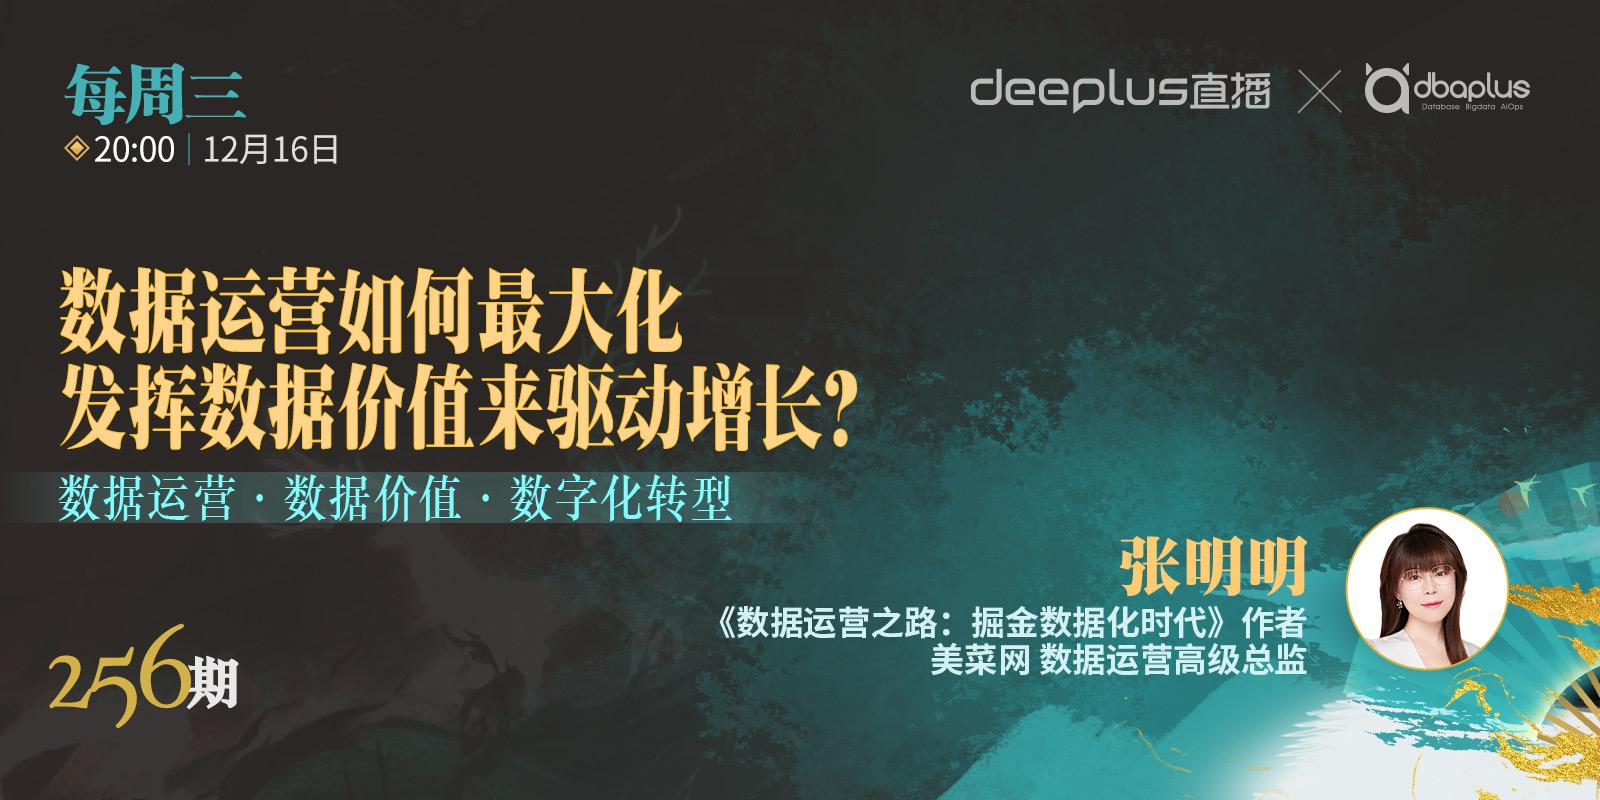 【dbaplus社群线上分享256期】数据运营如何最大化发挥数据价值来驱动增长?